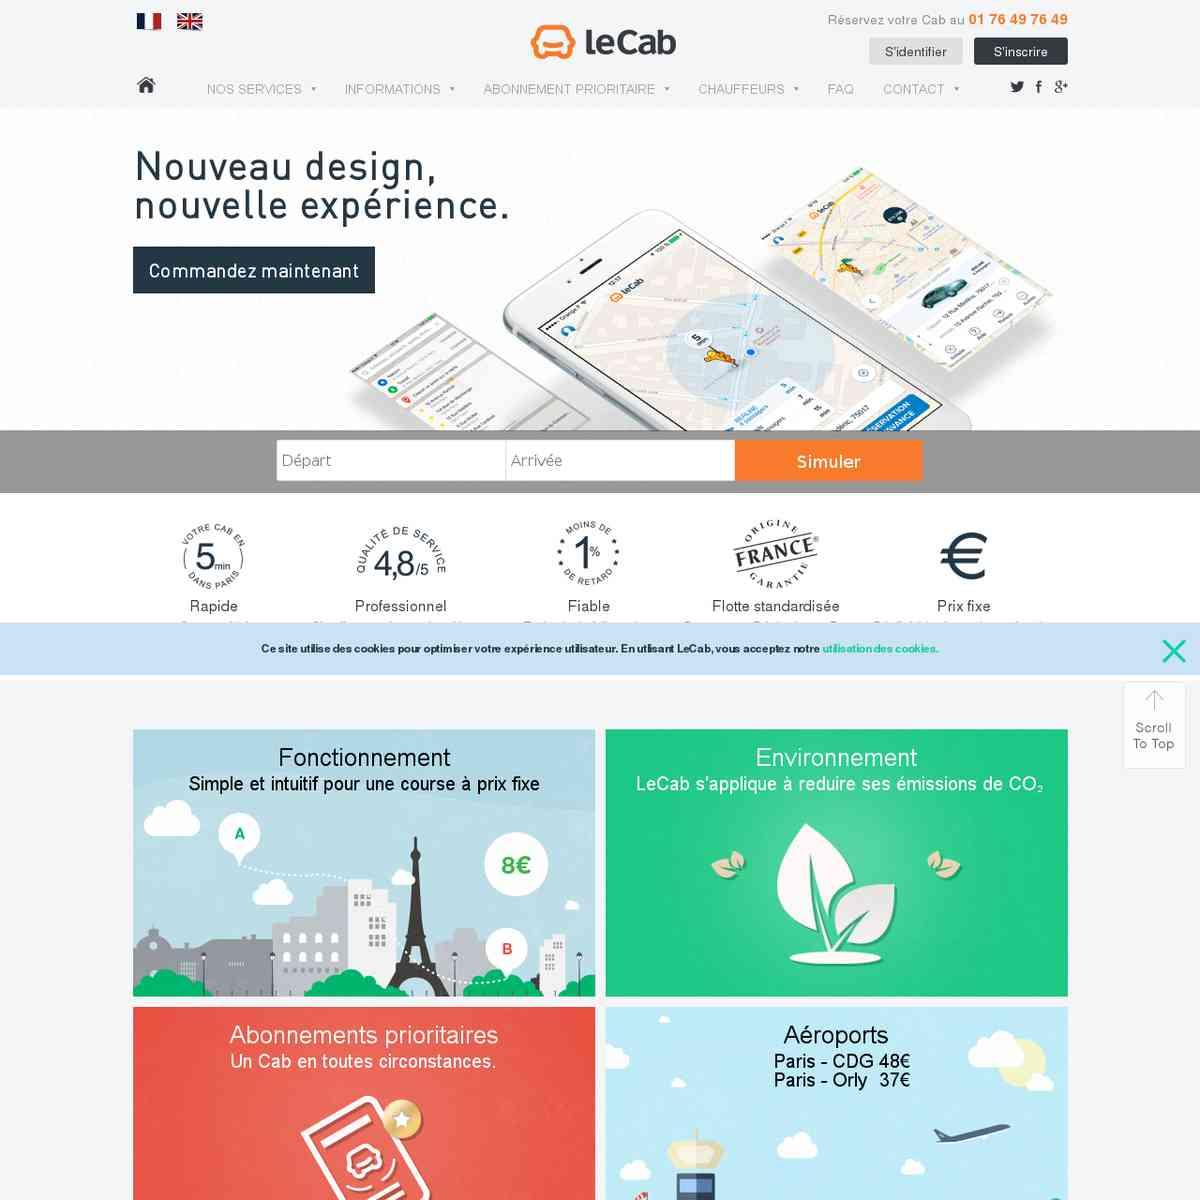 lecab.fr